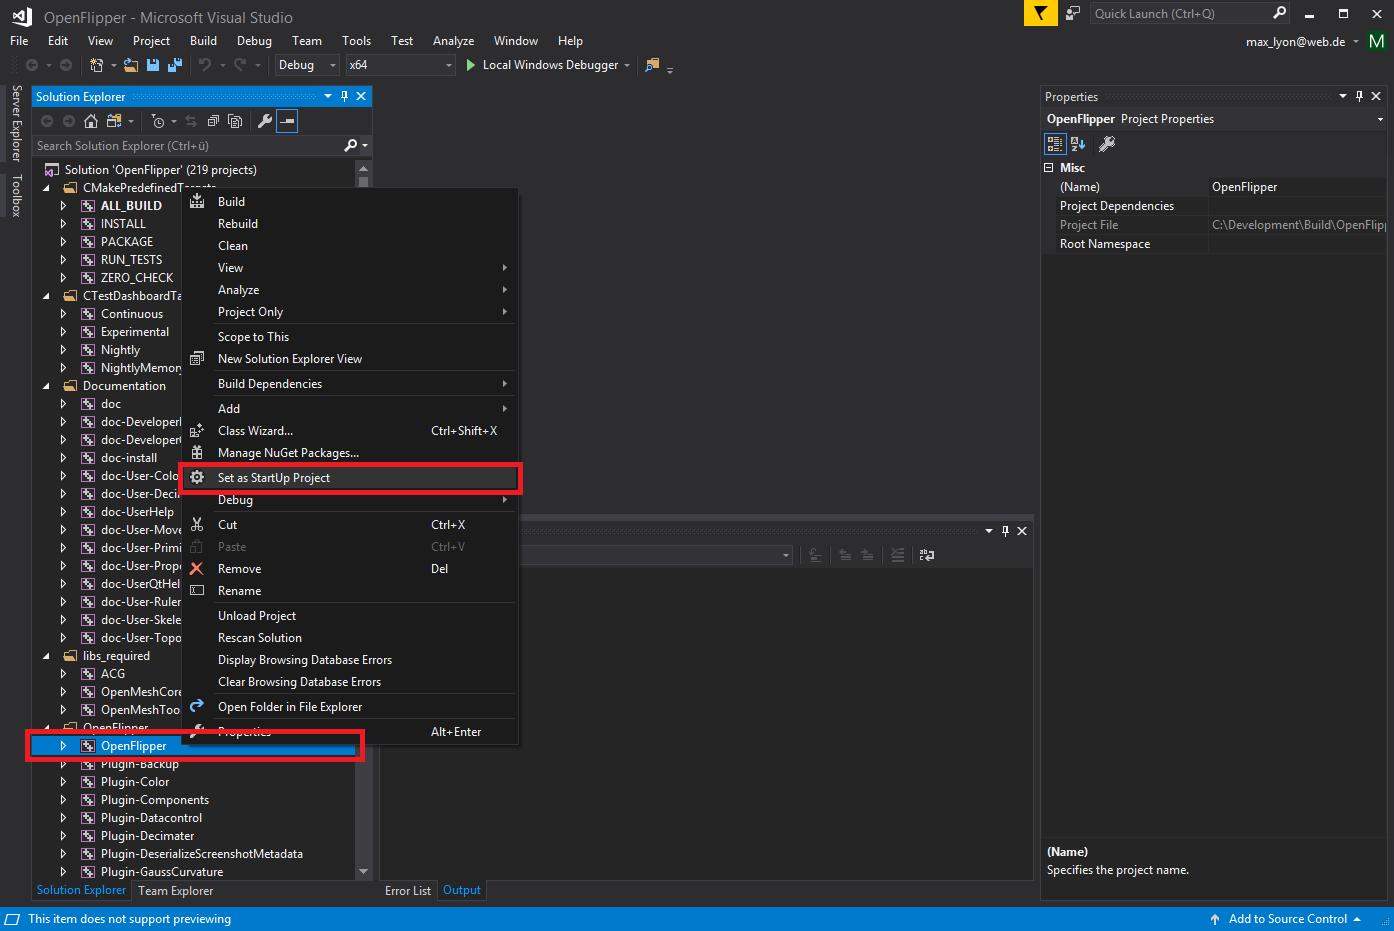 Documentation/DeveloperHelpSources/building-screenshots/14_set_as_startup_project.png